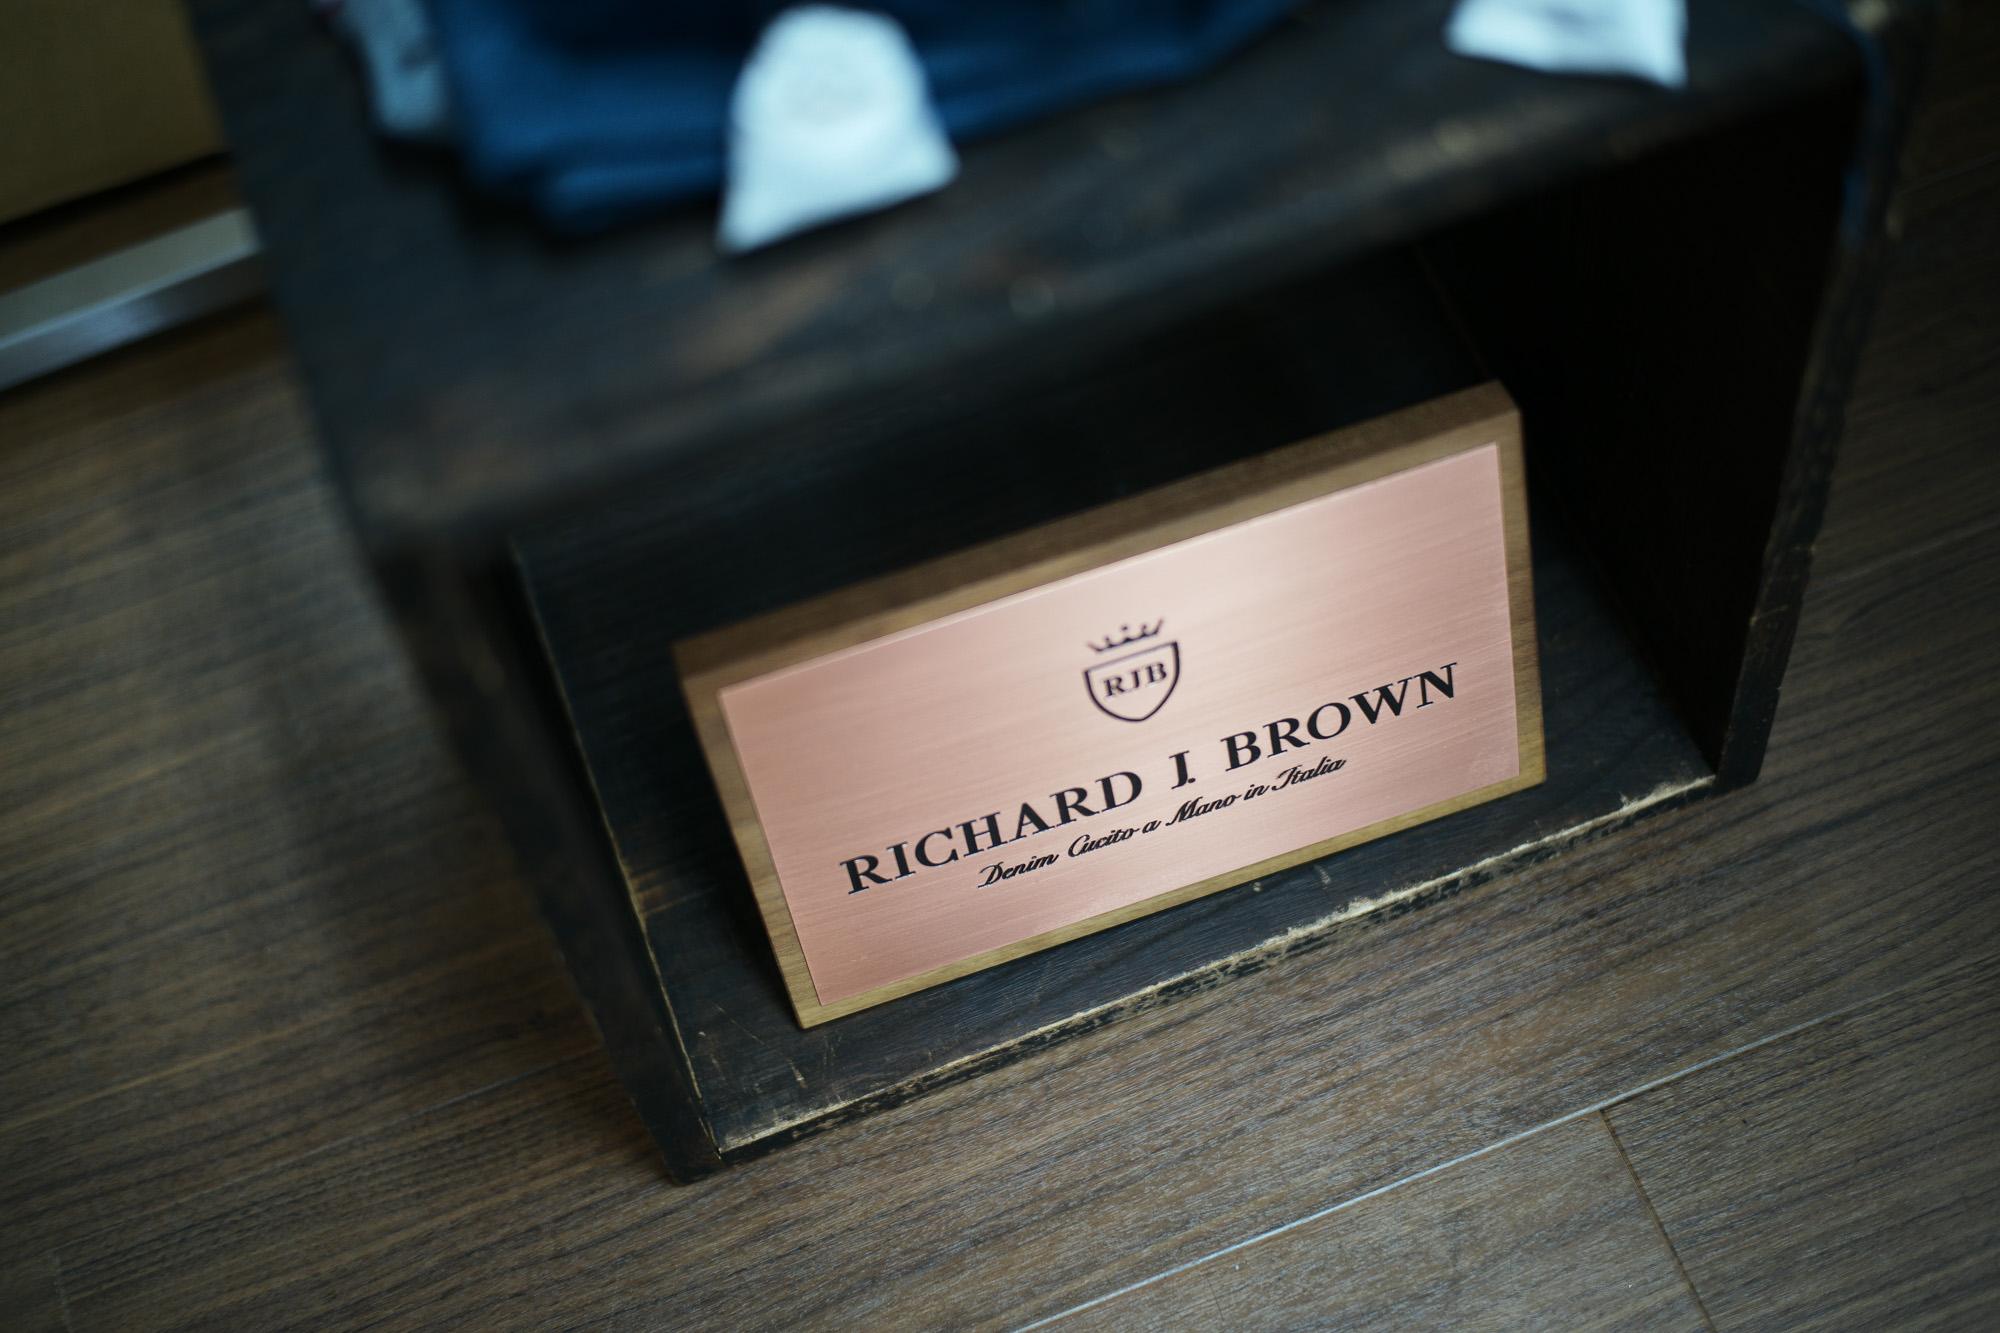 RICHARD J.BROWN / リチャードジェイブラウン (2018 秋冬 プレ 展示会) RICHARDJBROWN リチャードジェイブラウン デニムパンツ DENIM 2018年春夏 展示会。愛知 名古屋 ZODIAC  ジーンズ